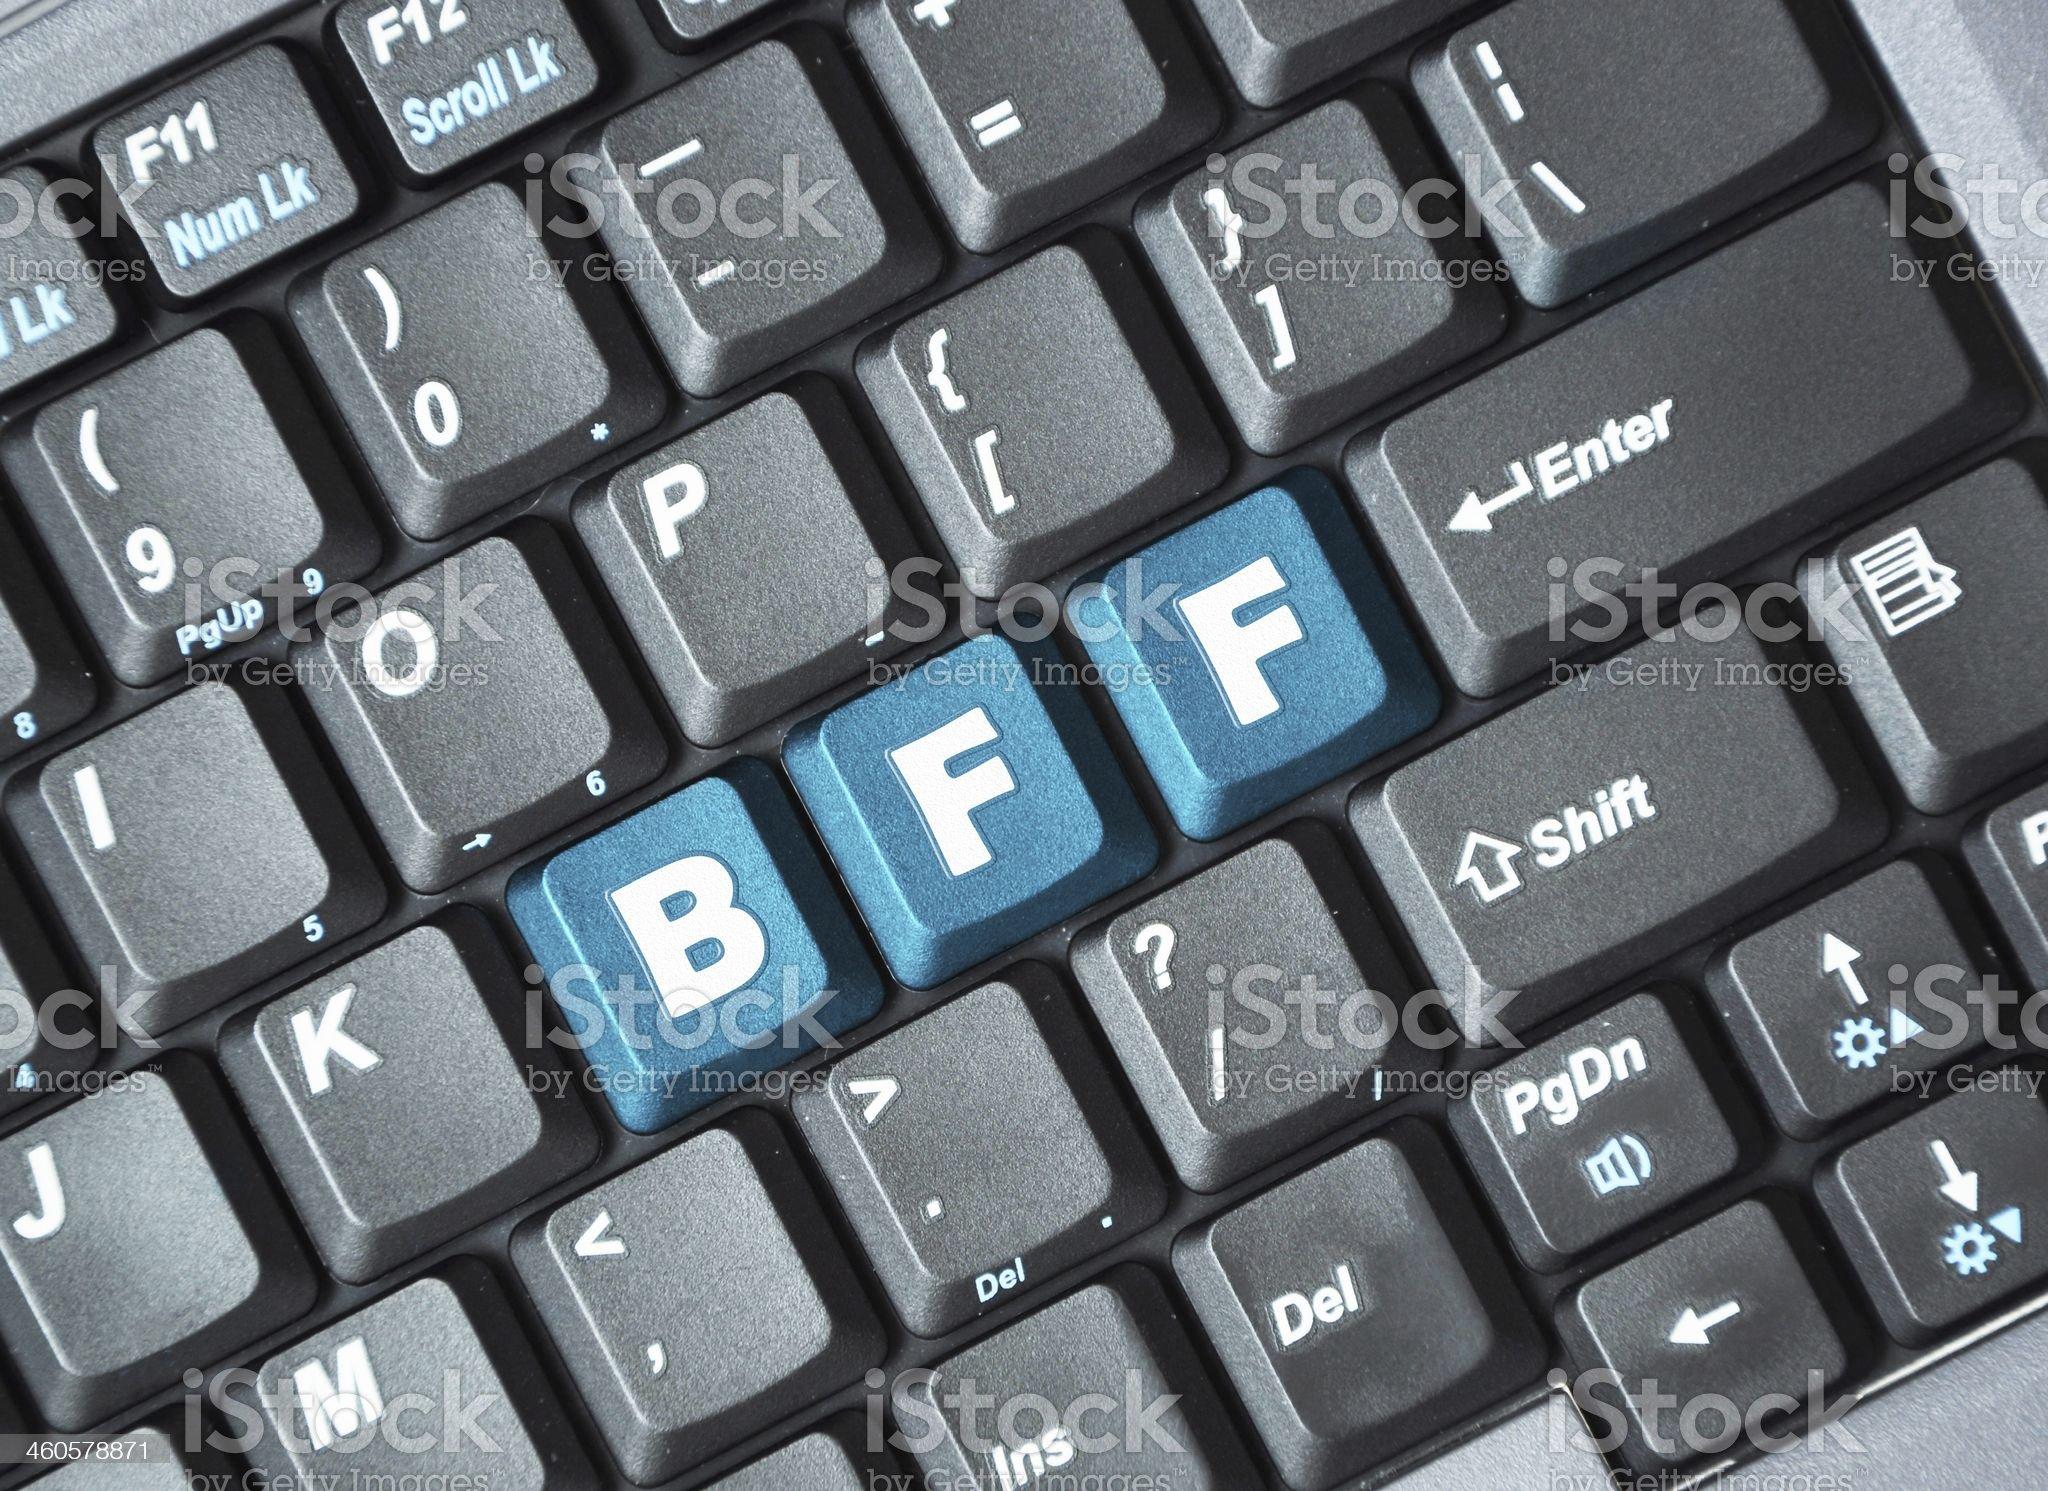 Bff key on keyboard royalty-free stock photo